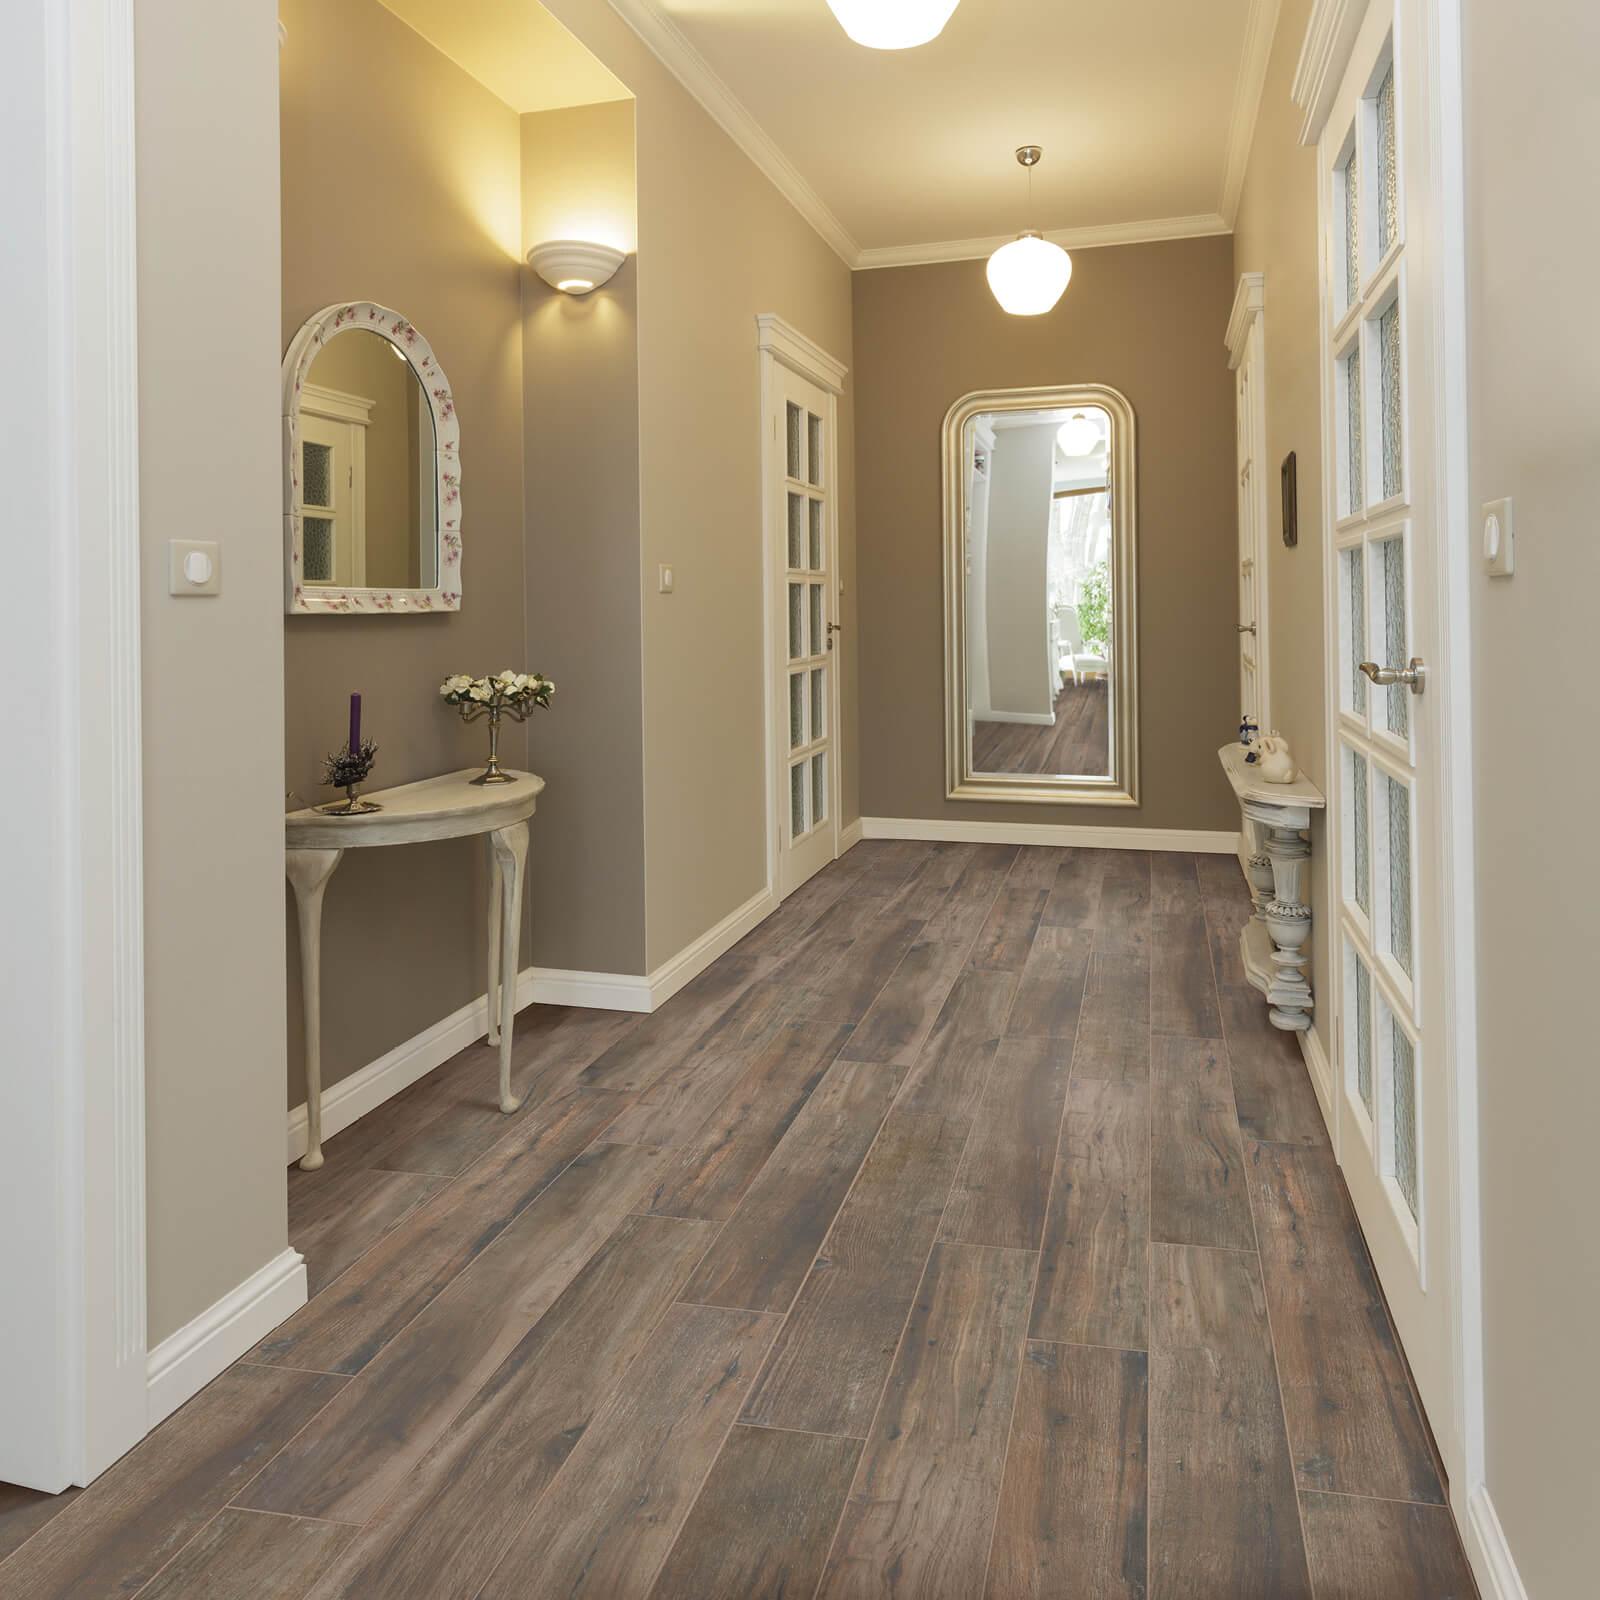 Magnolia Bend Ozark Brown flooring | Dolphin Carpet & Tile